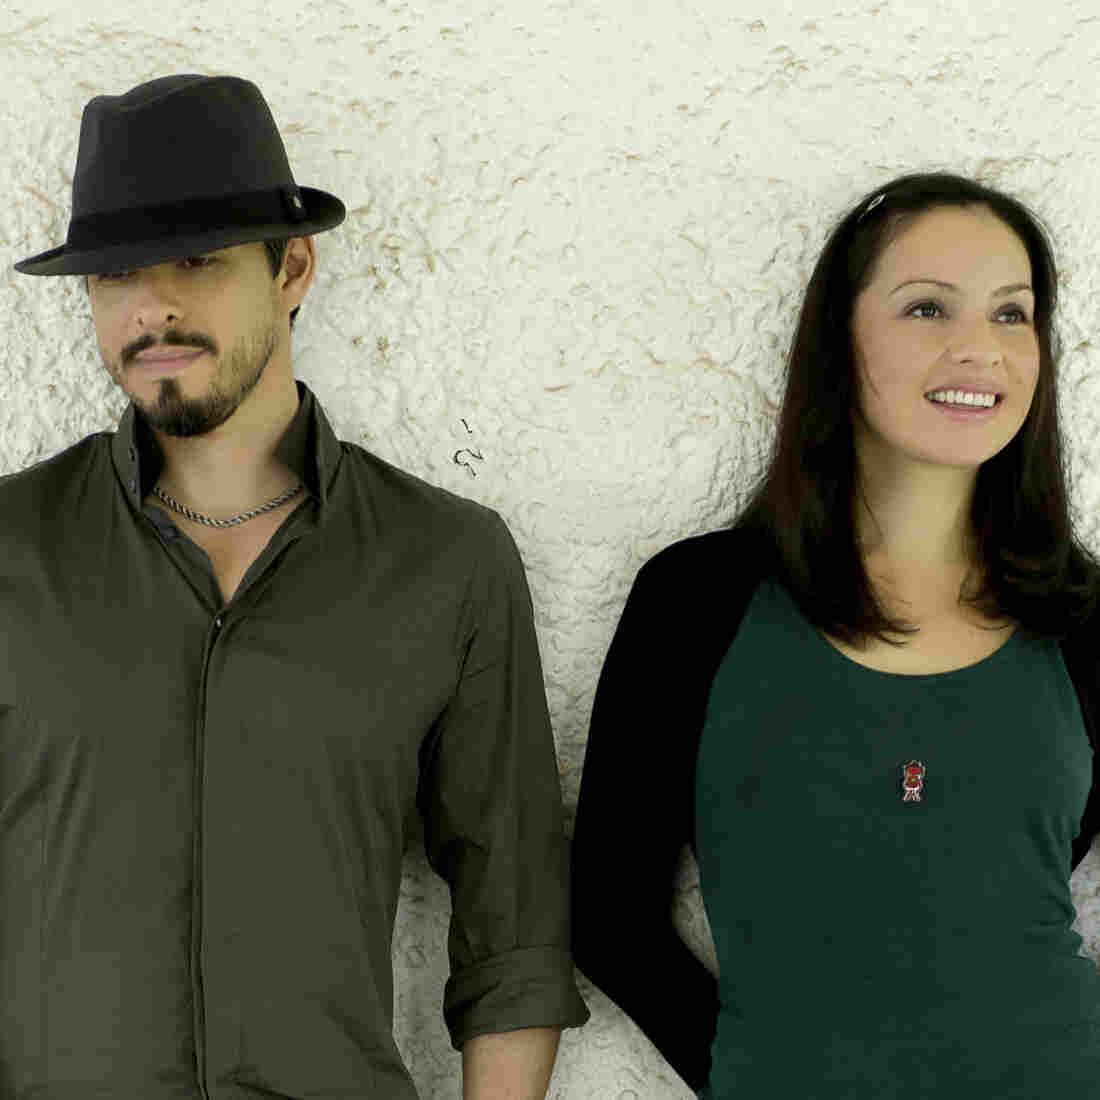 Rodrigo Y Gabriela's latest album is 9 Dead Alive.